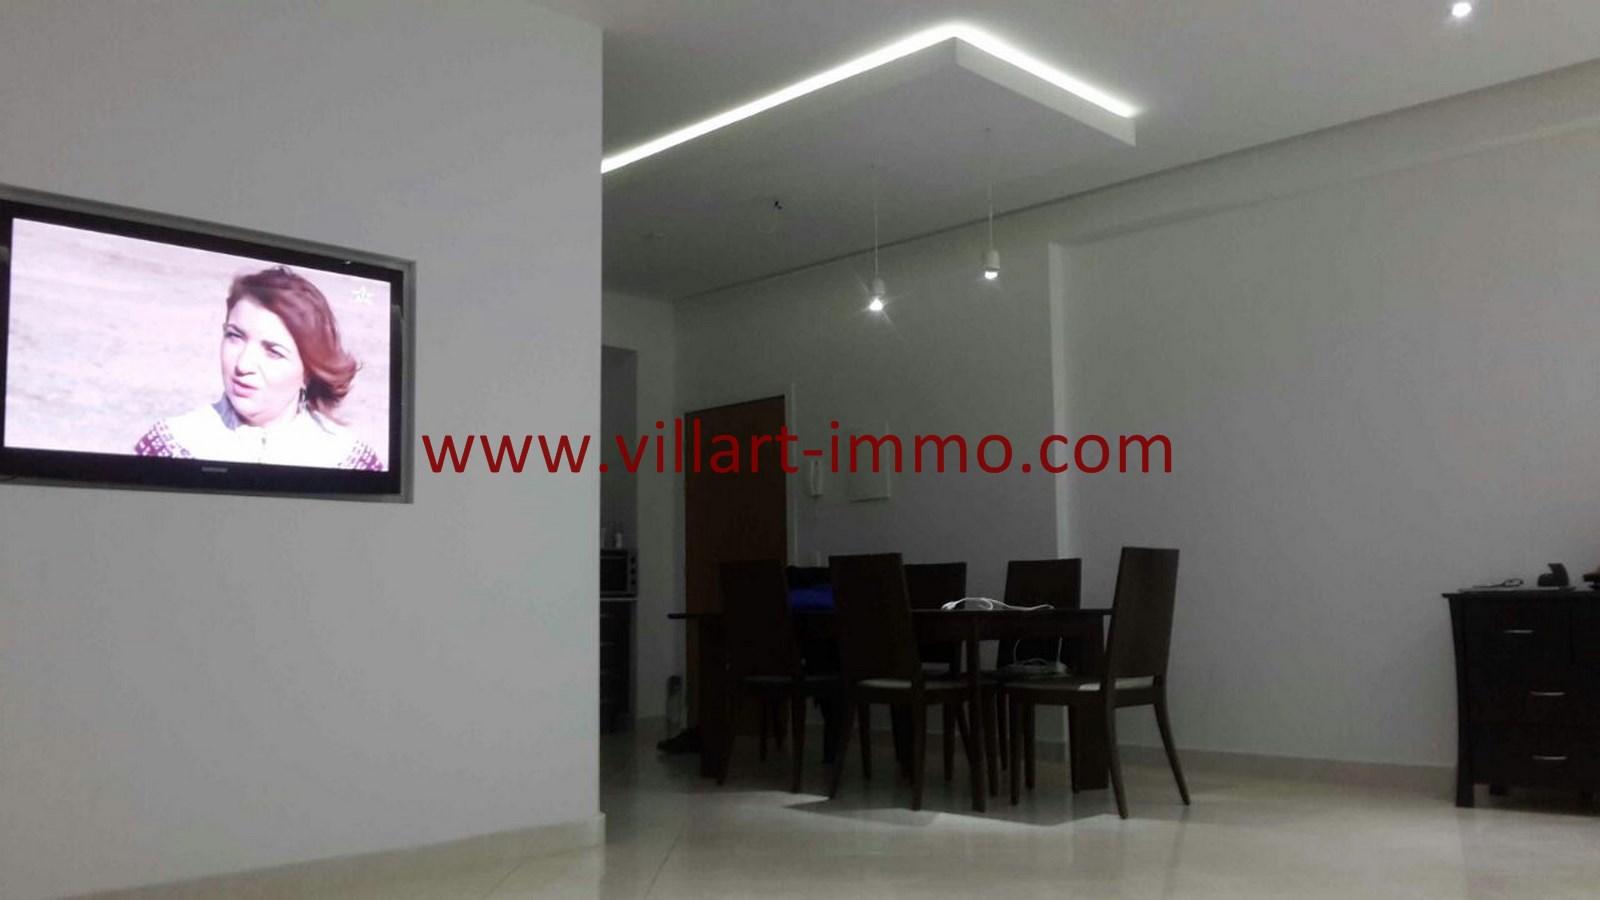 5-Vente-Appartement-Tanger-Malabata-Séjour-VA490-Villart Immo (Copier)